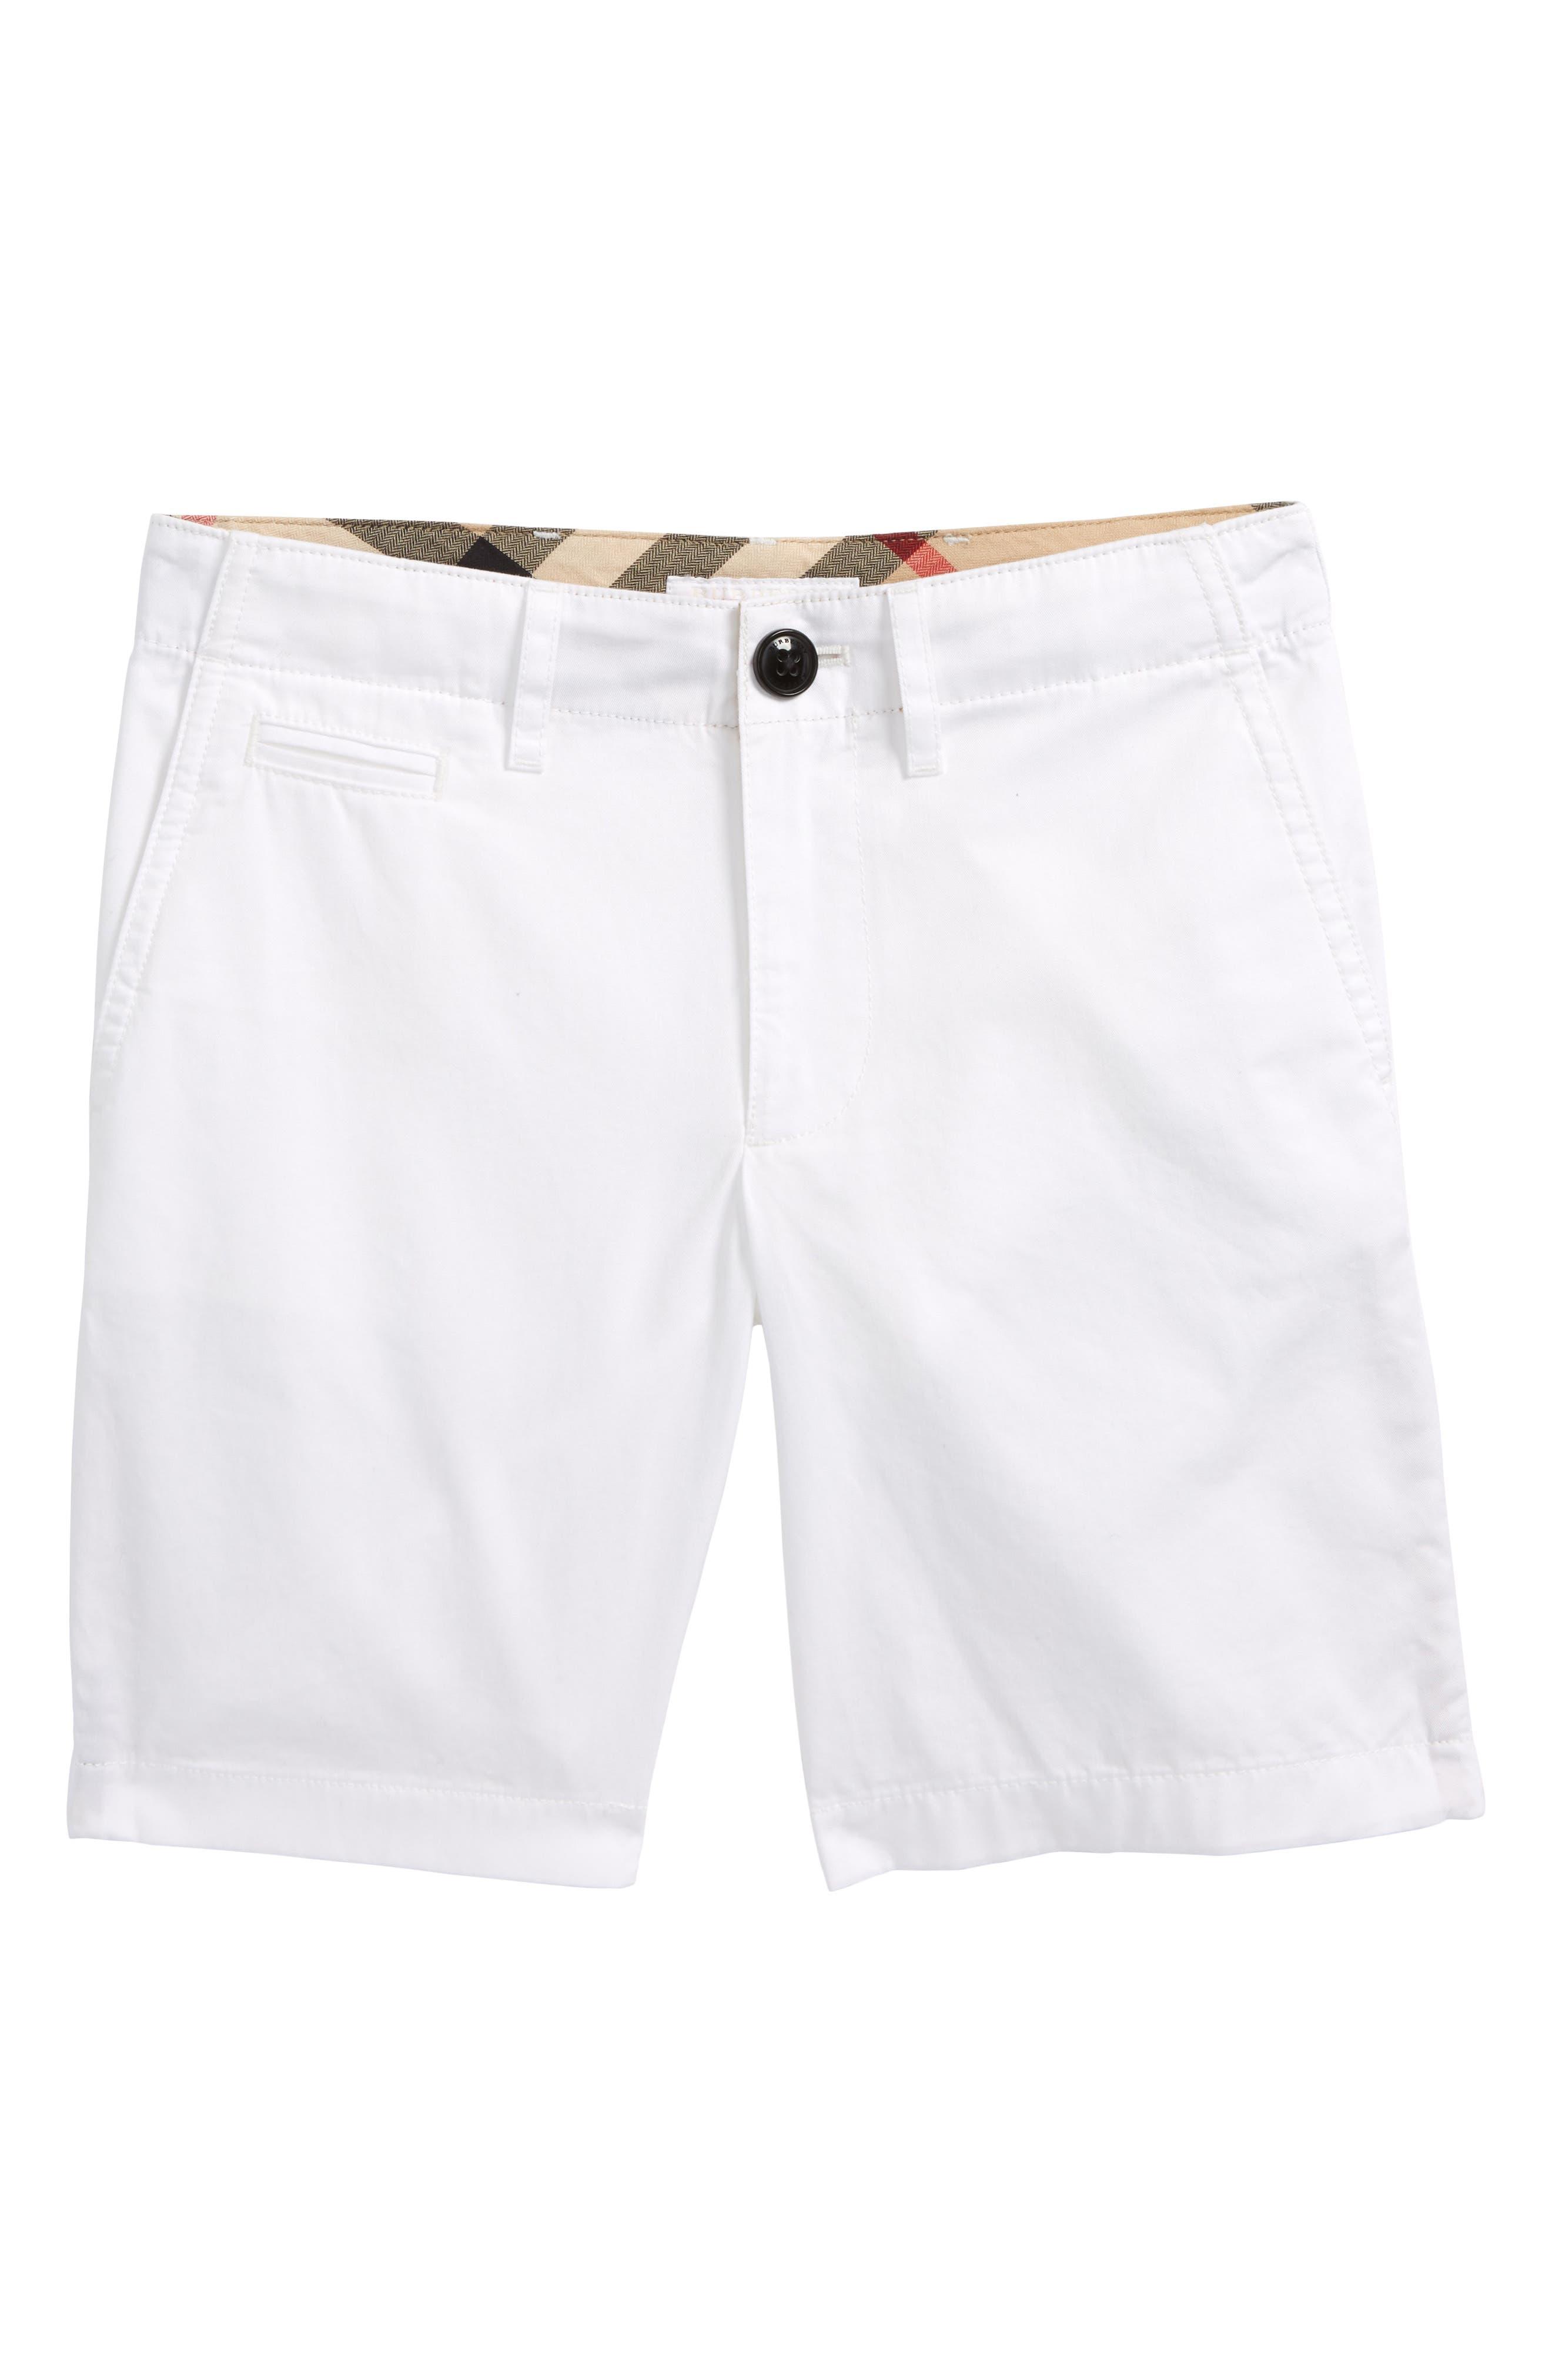 Tristen Cotton Twill Shorts,                             Main thumbnail 1, color,                             100